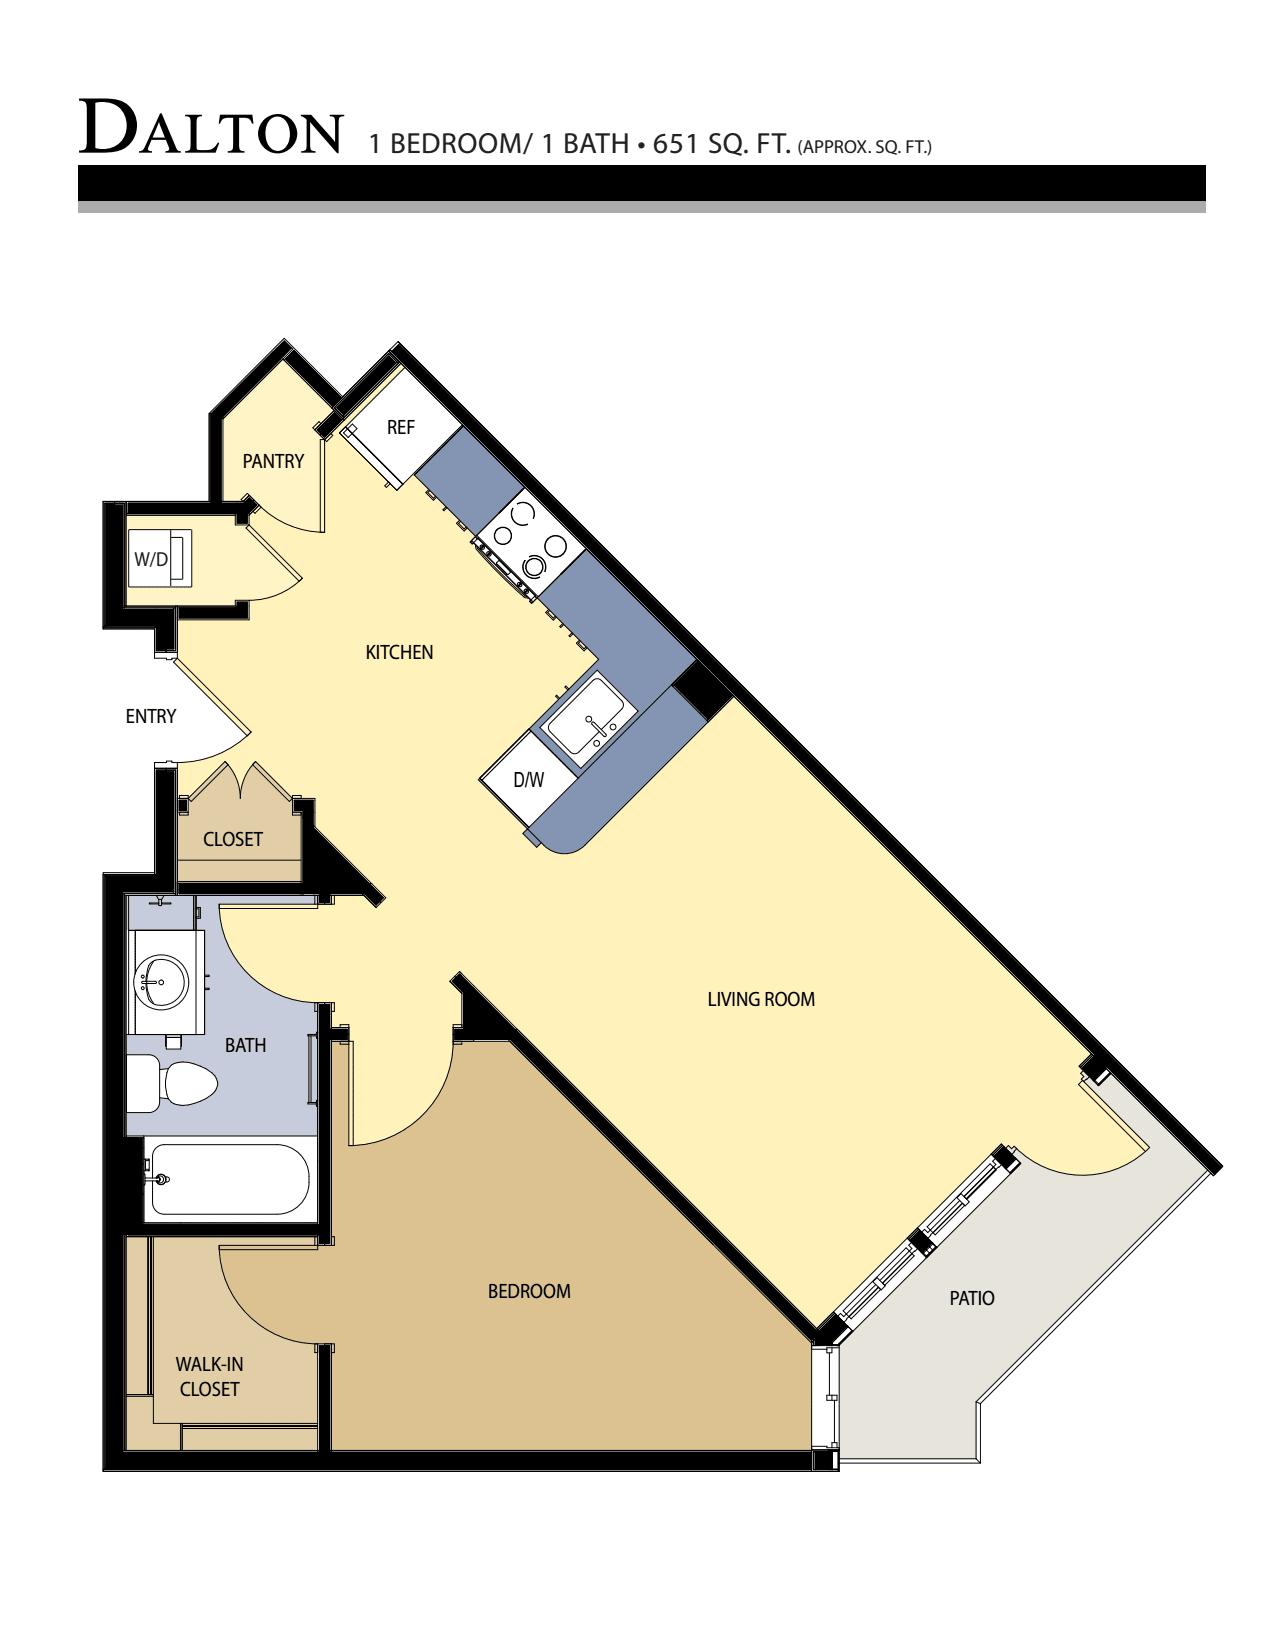 Dalton floor plan - 1 Bed / 1 Bath (651 Sq Ft)